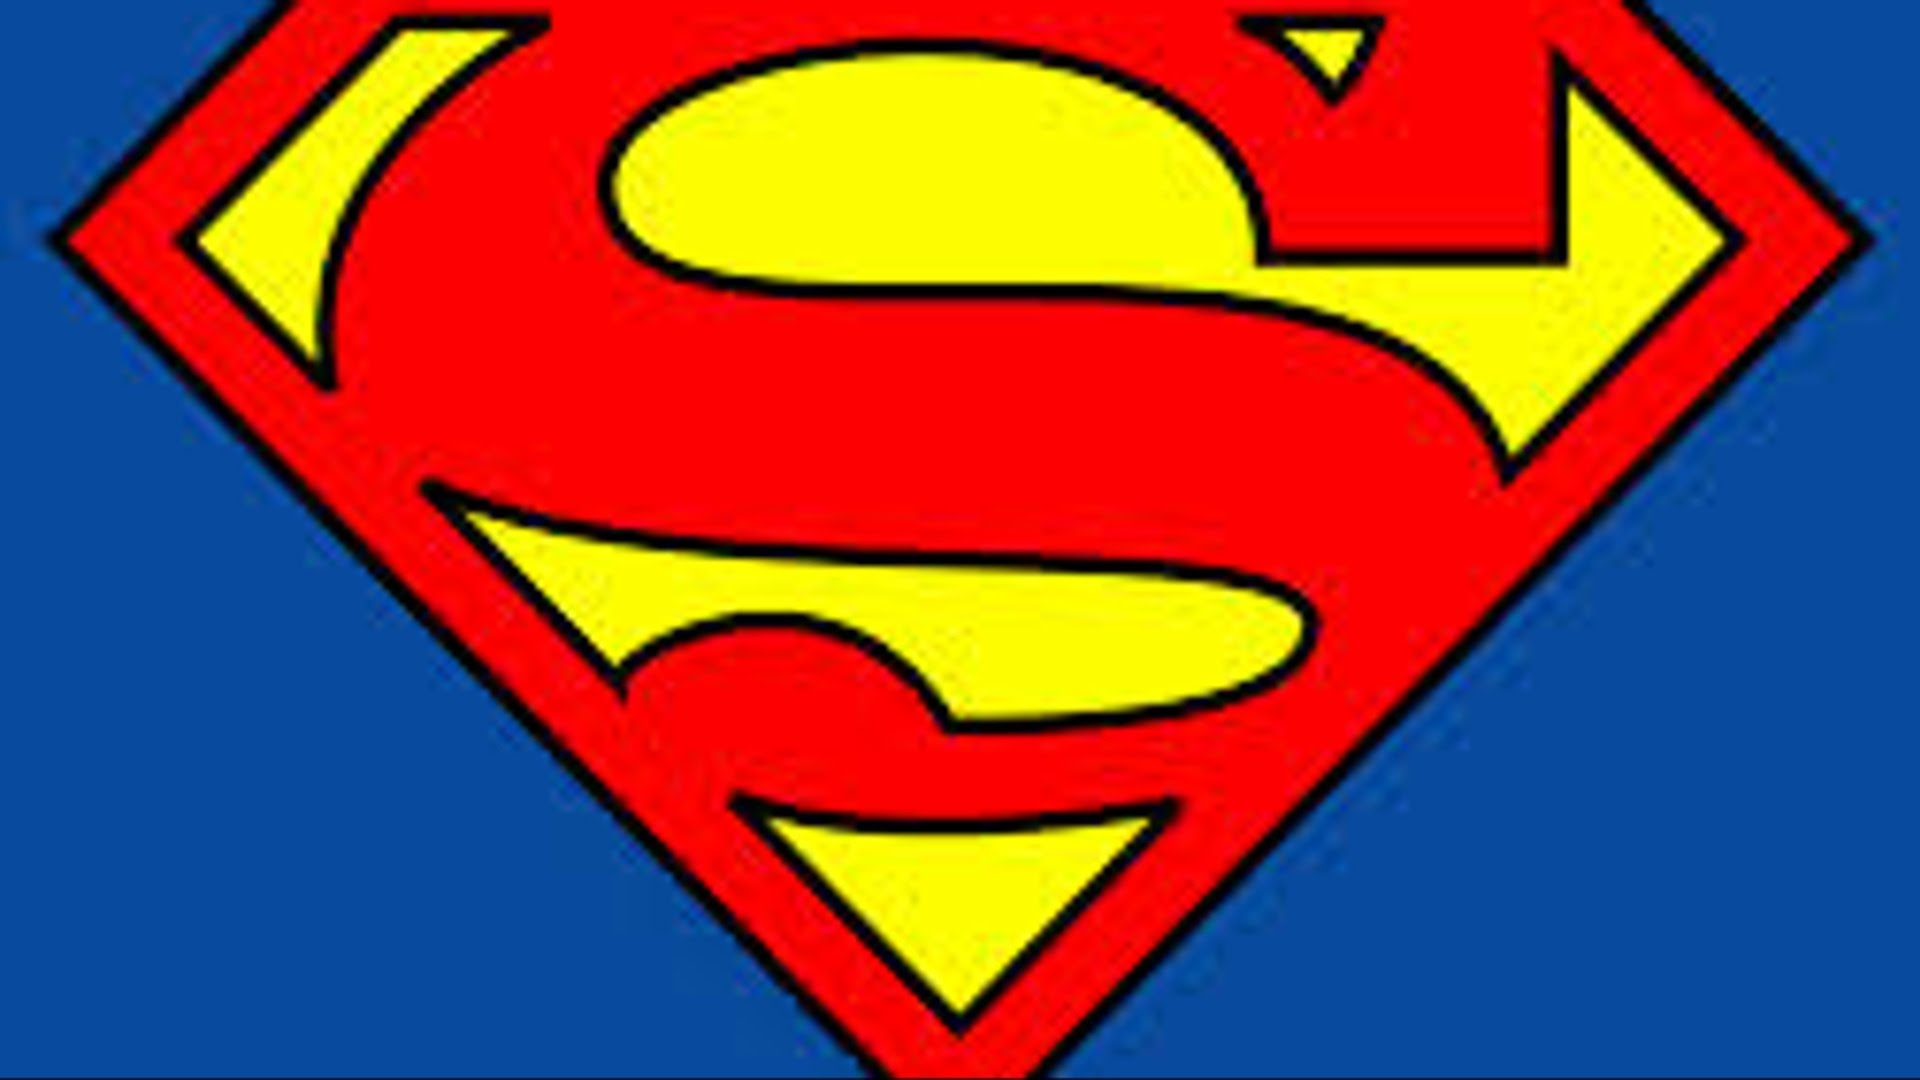 Superman Batman Symbol Wpmorganrlewis Clipart Free Clip Art